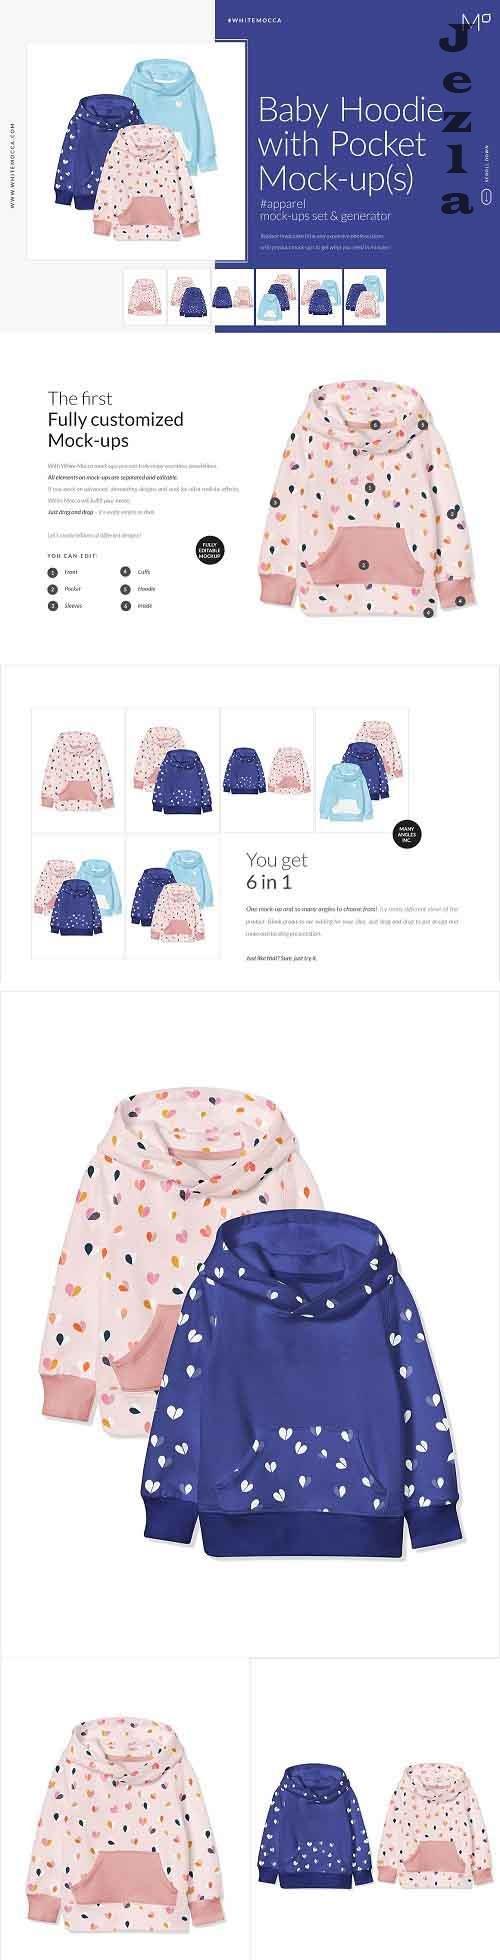 CreativeMarket - Baby Hoodie with Pocket Mock-ups 4543496